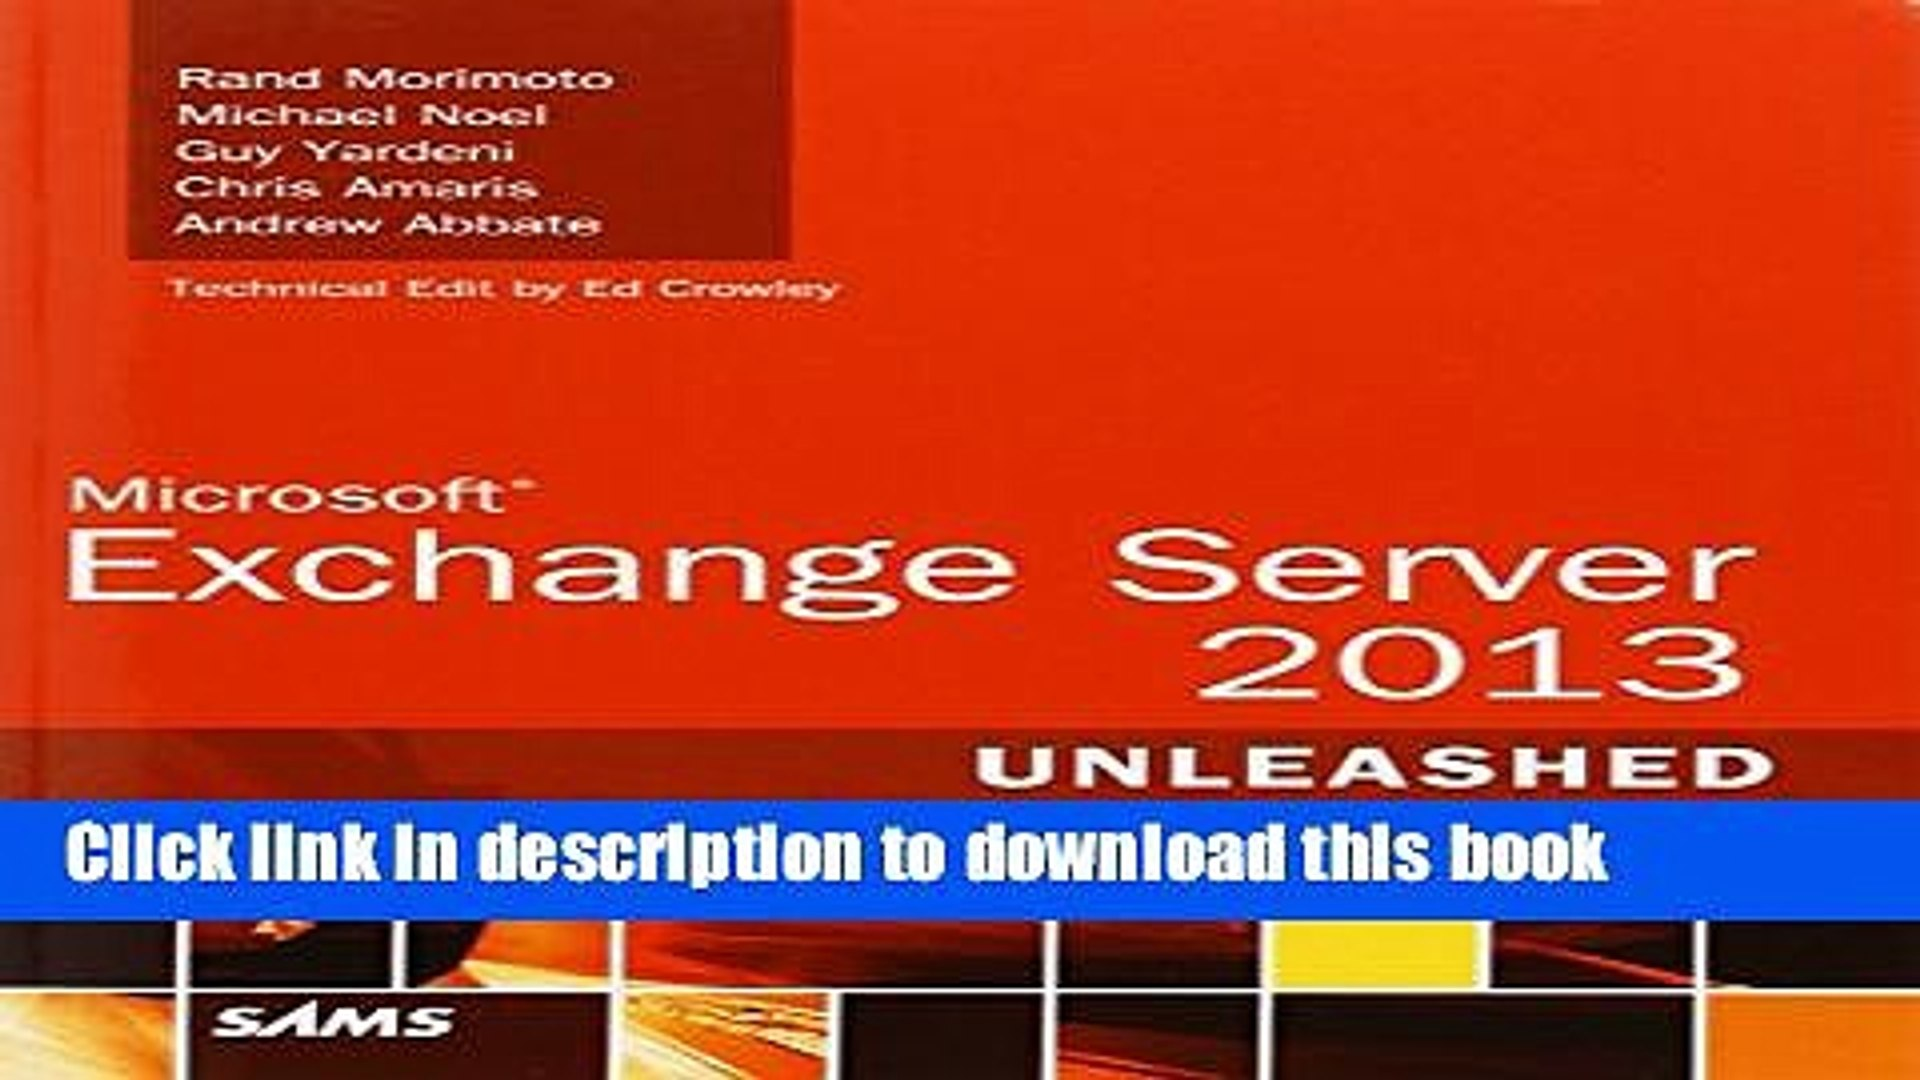 [Download] Microsoft Exchange Server 2013 Unleashed Paperback Free